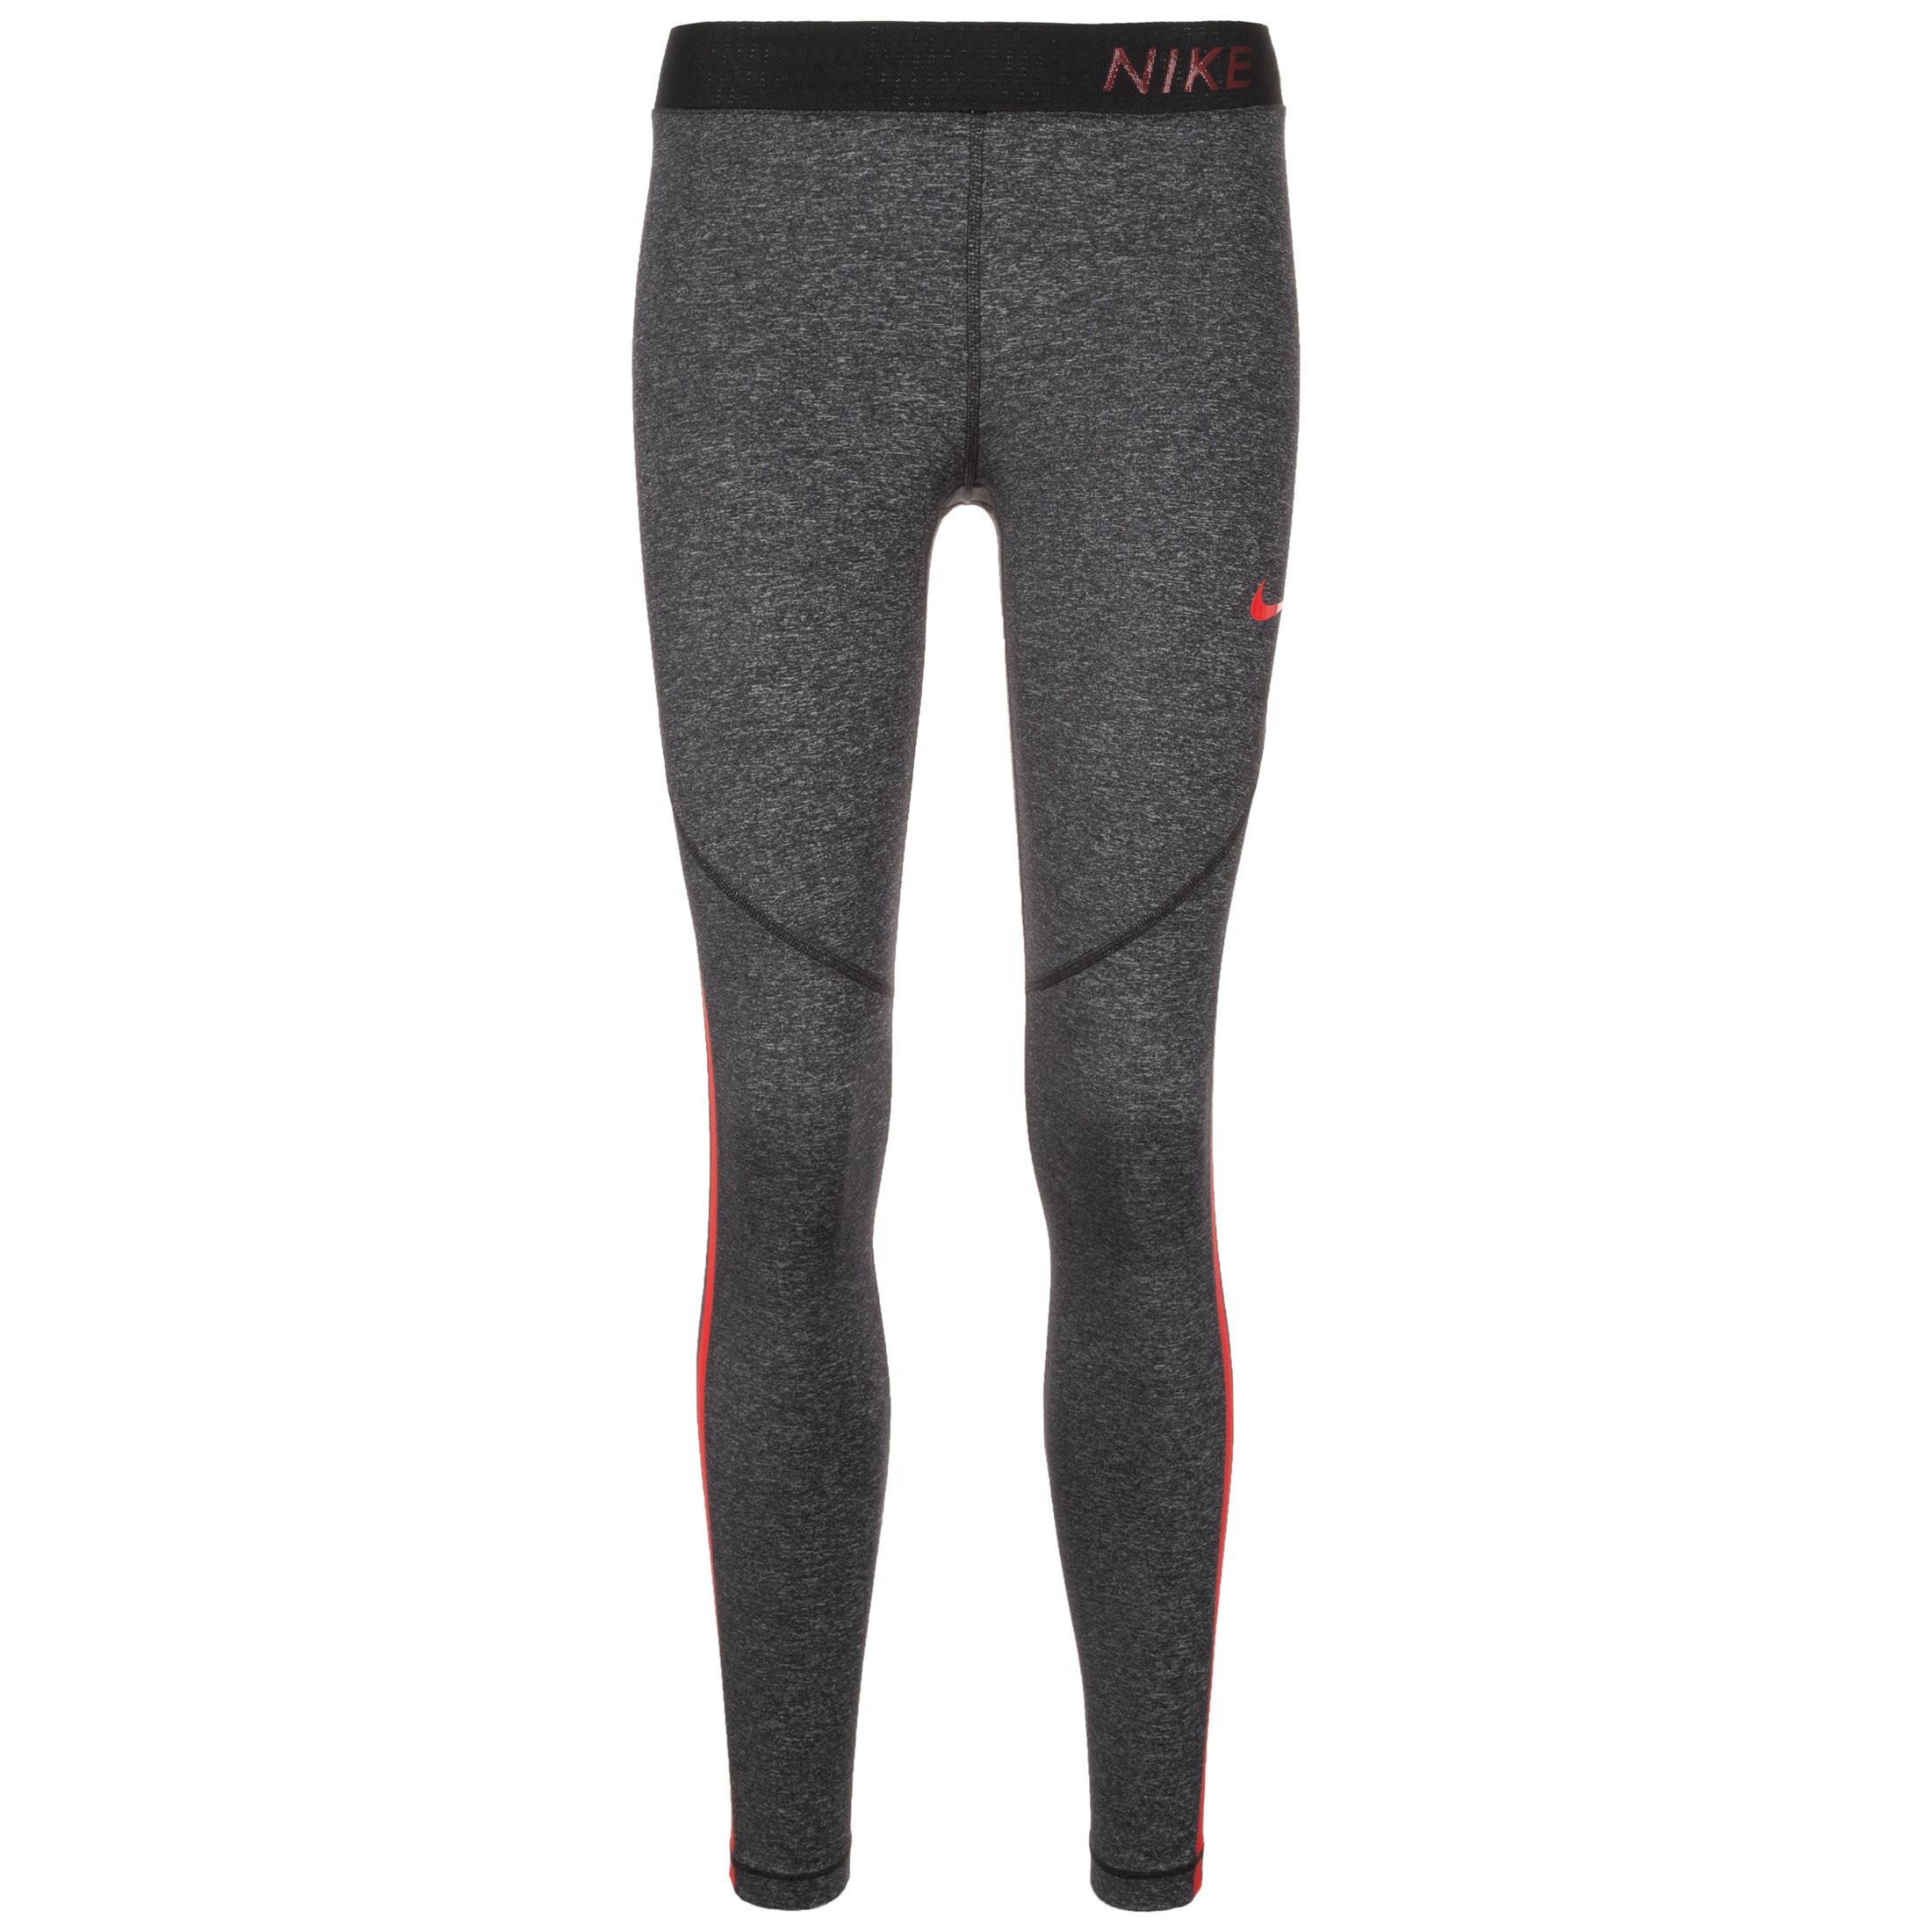 e322ef21addd8e Nike Pro Hypercool Tights - Heather Black/Red Women   941648-011   FOOTY.COM